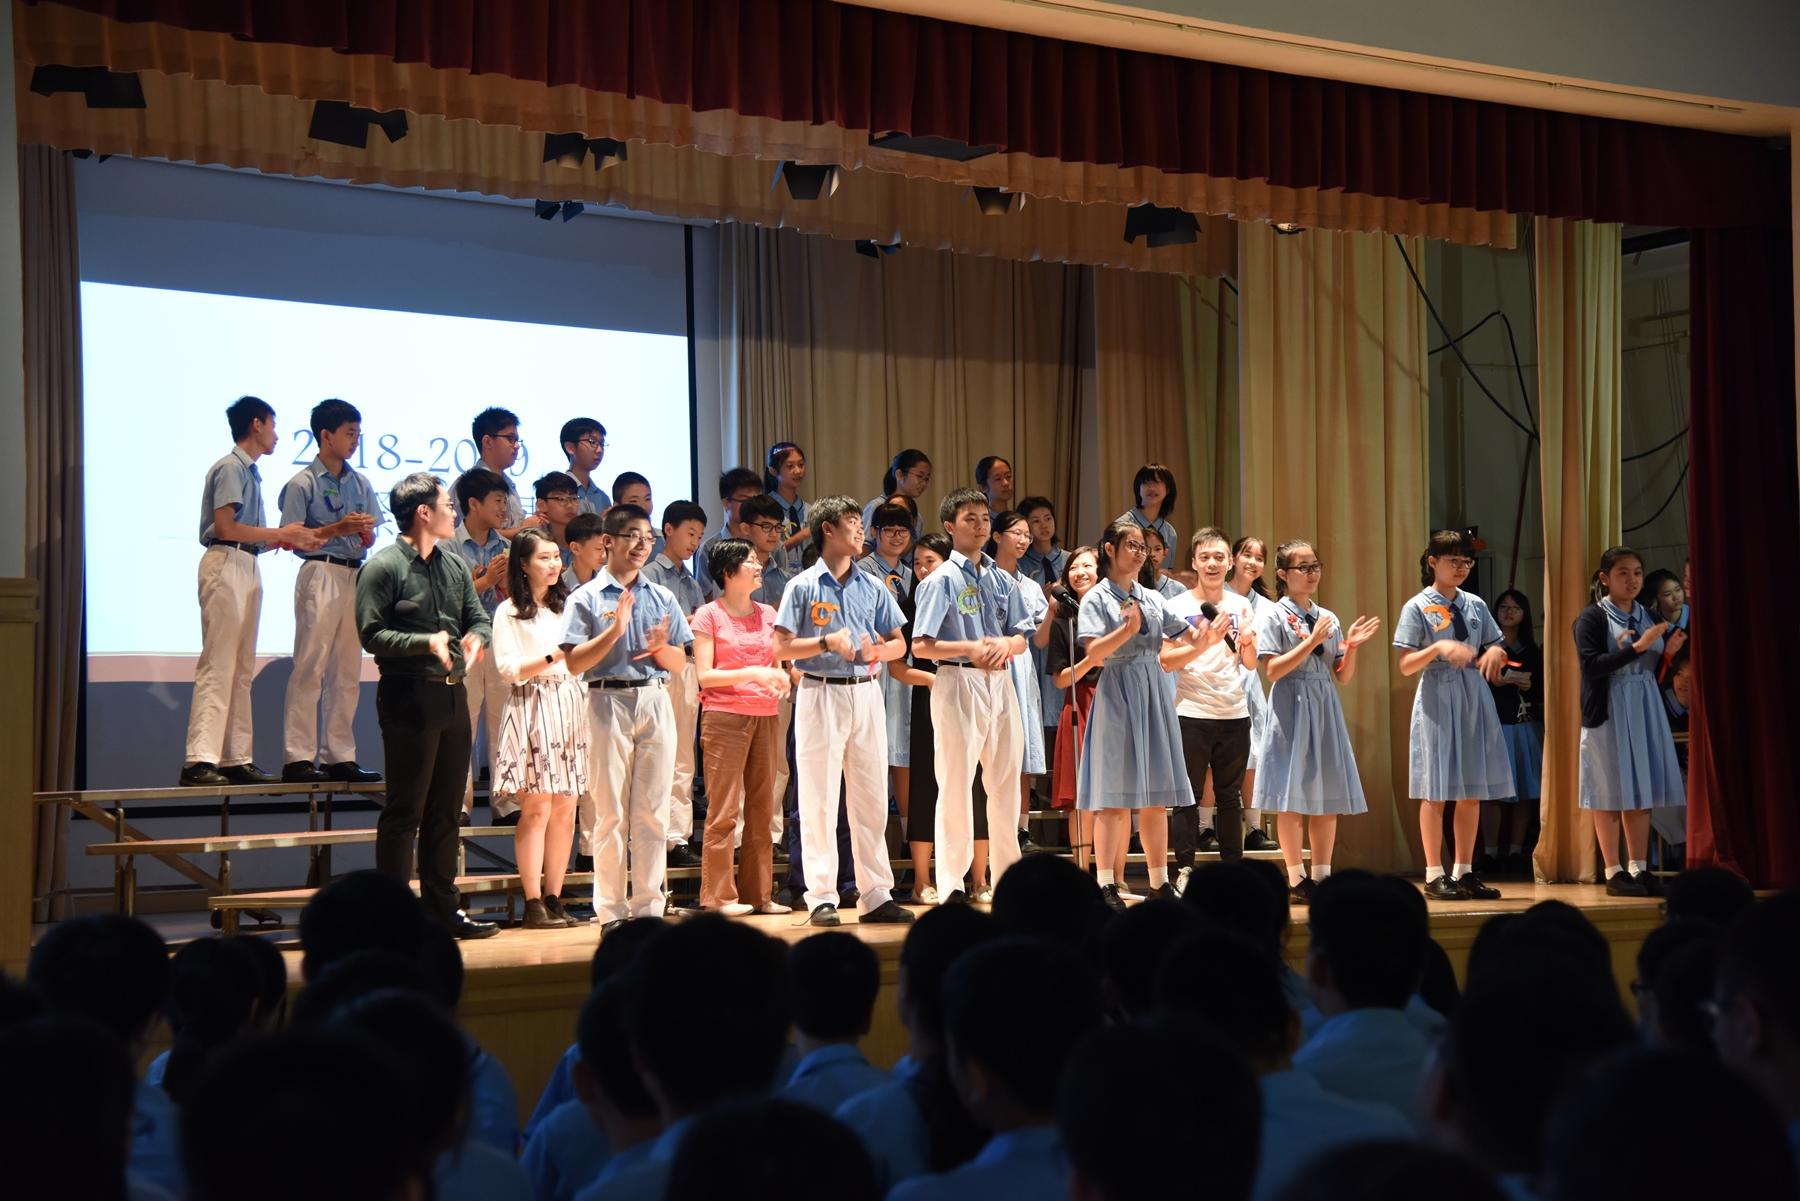 http://npc.edu.hk/sites/default/files/1c.jpg